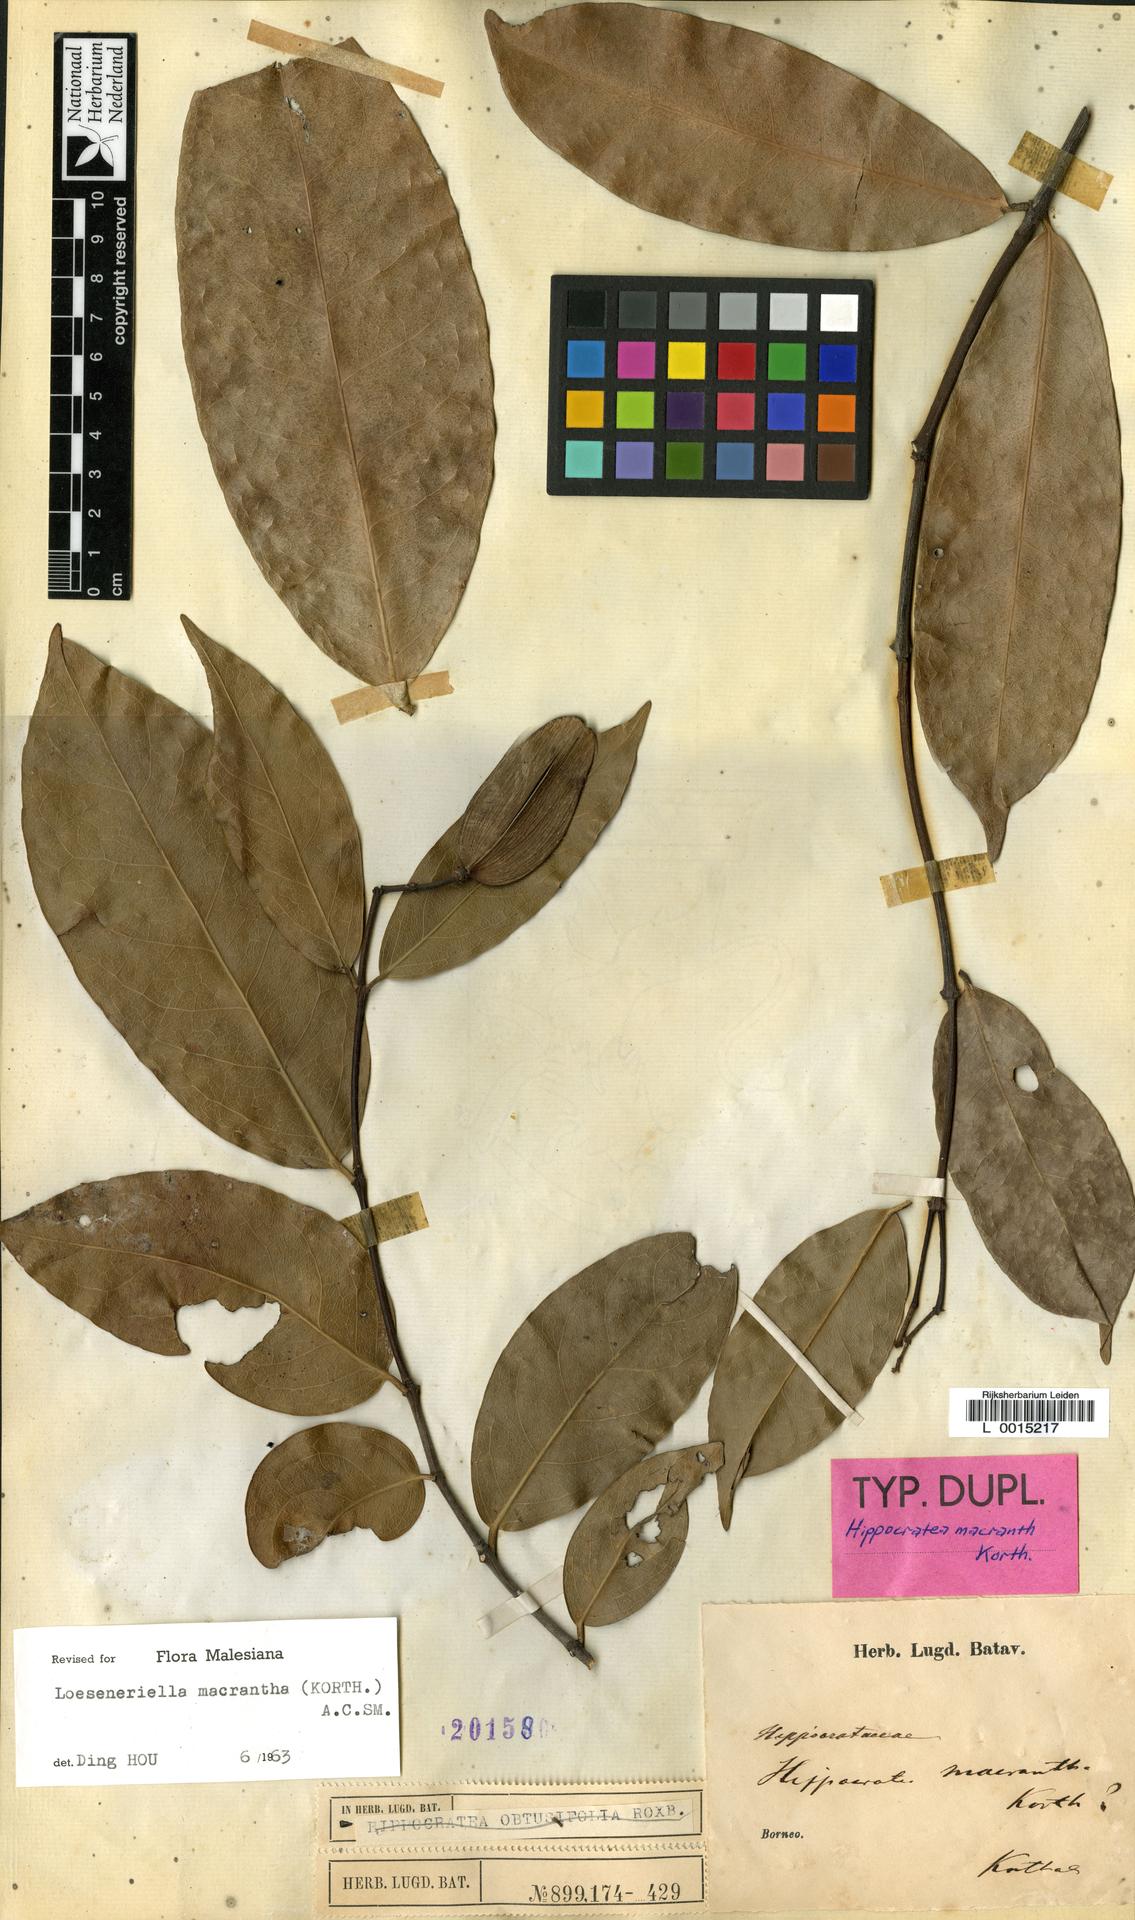 L  0015217 | Loeseneriella macrantha (Korth.) A.C.Sm.